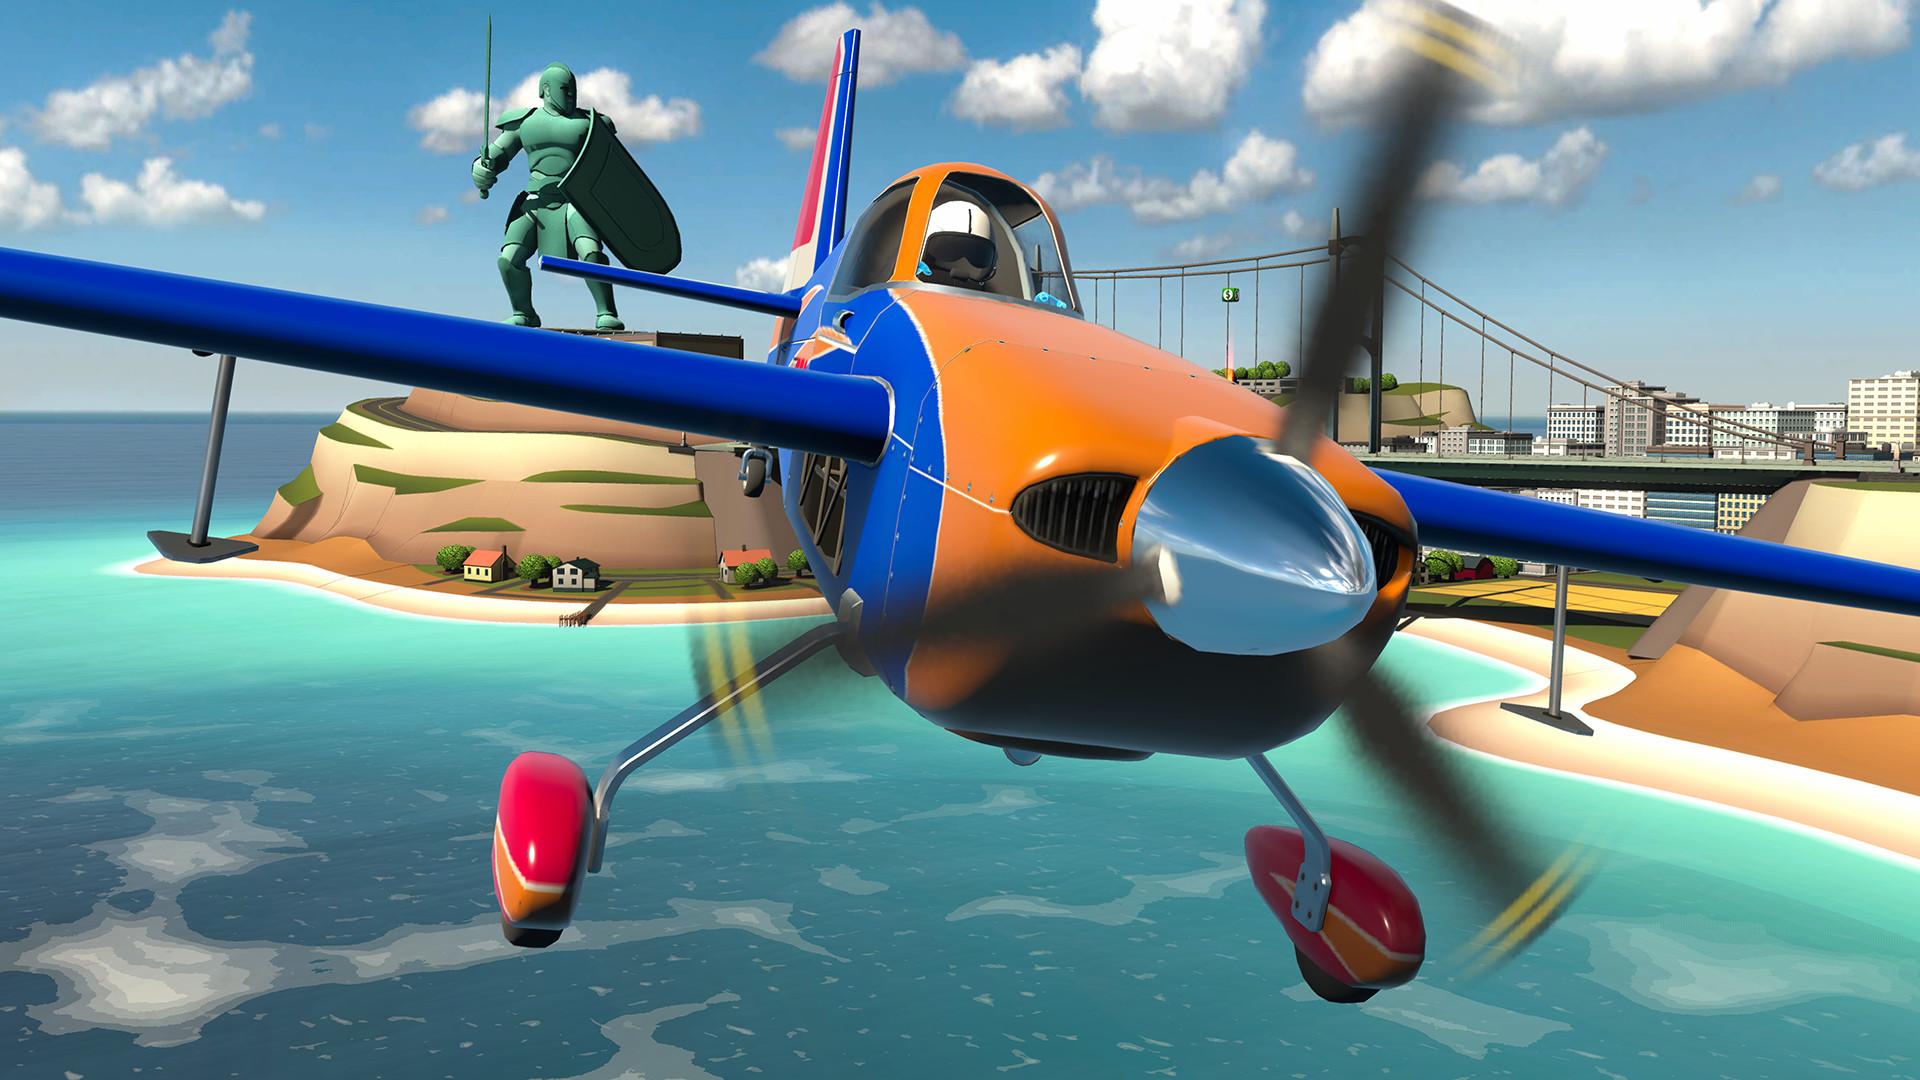 Oculus Quest 游戏《Ultrawings》模拟飞行插图(4)